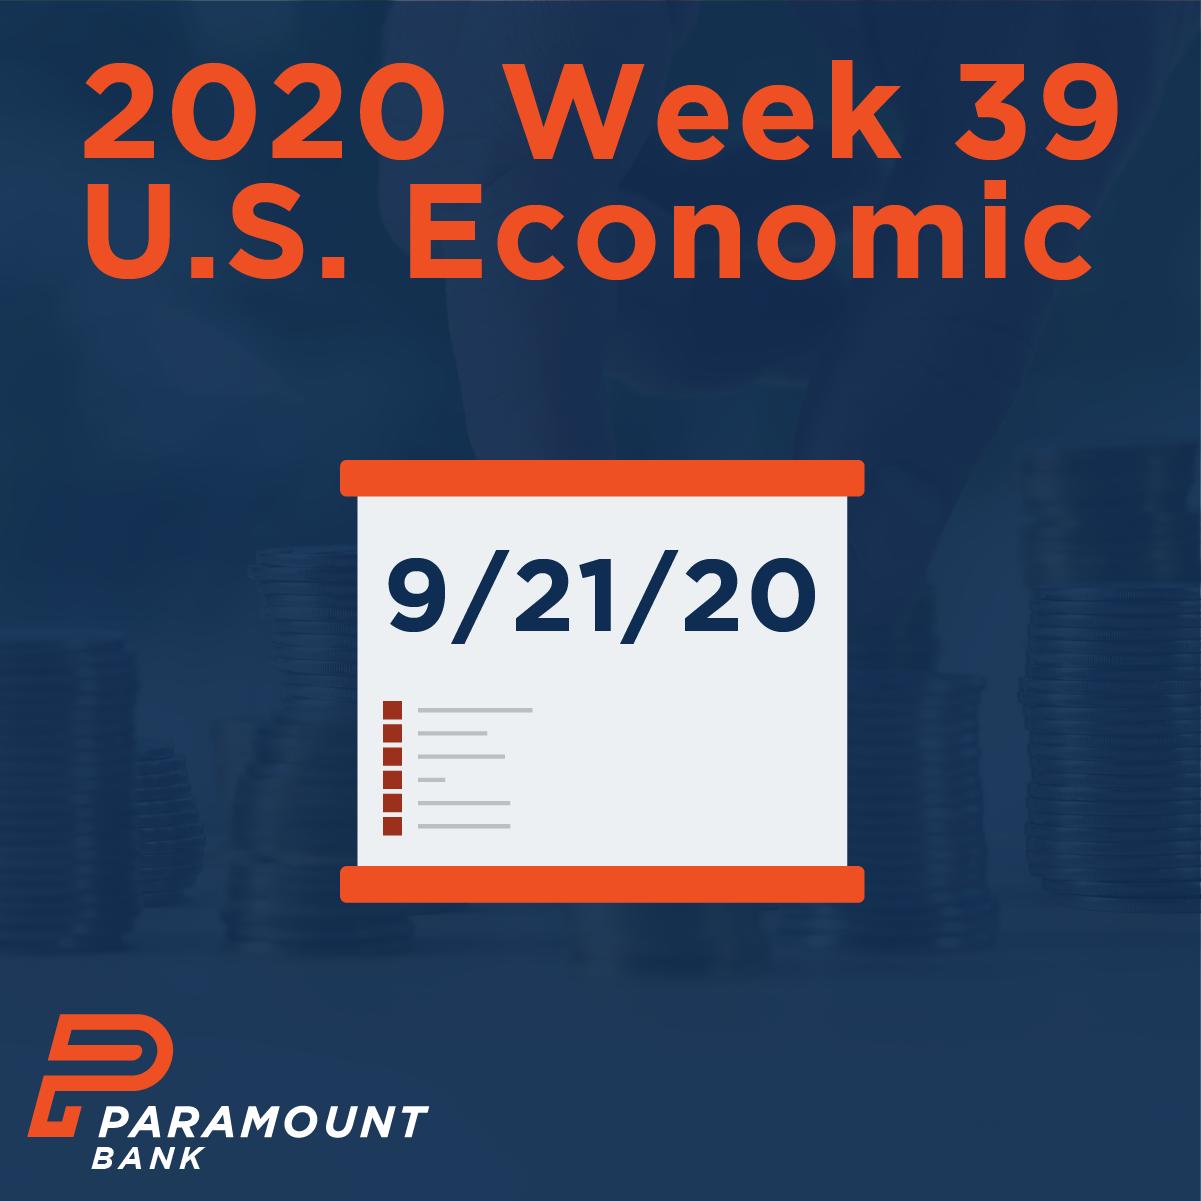 Week 39 econ update